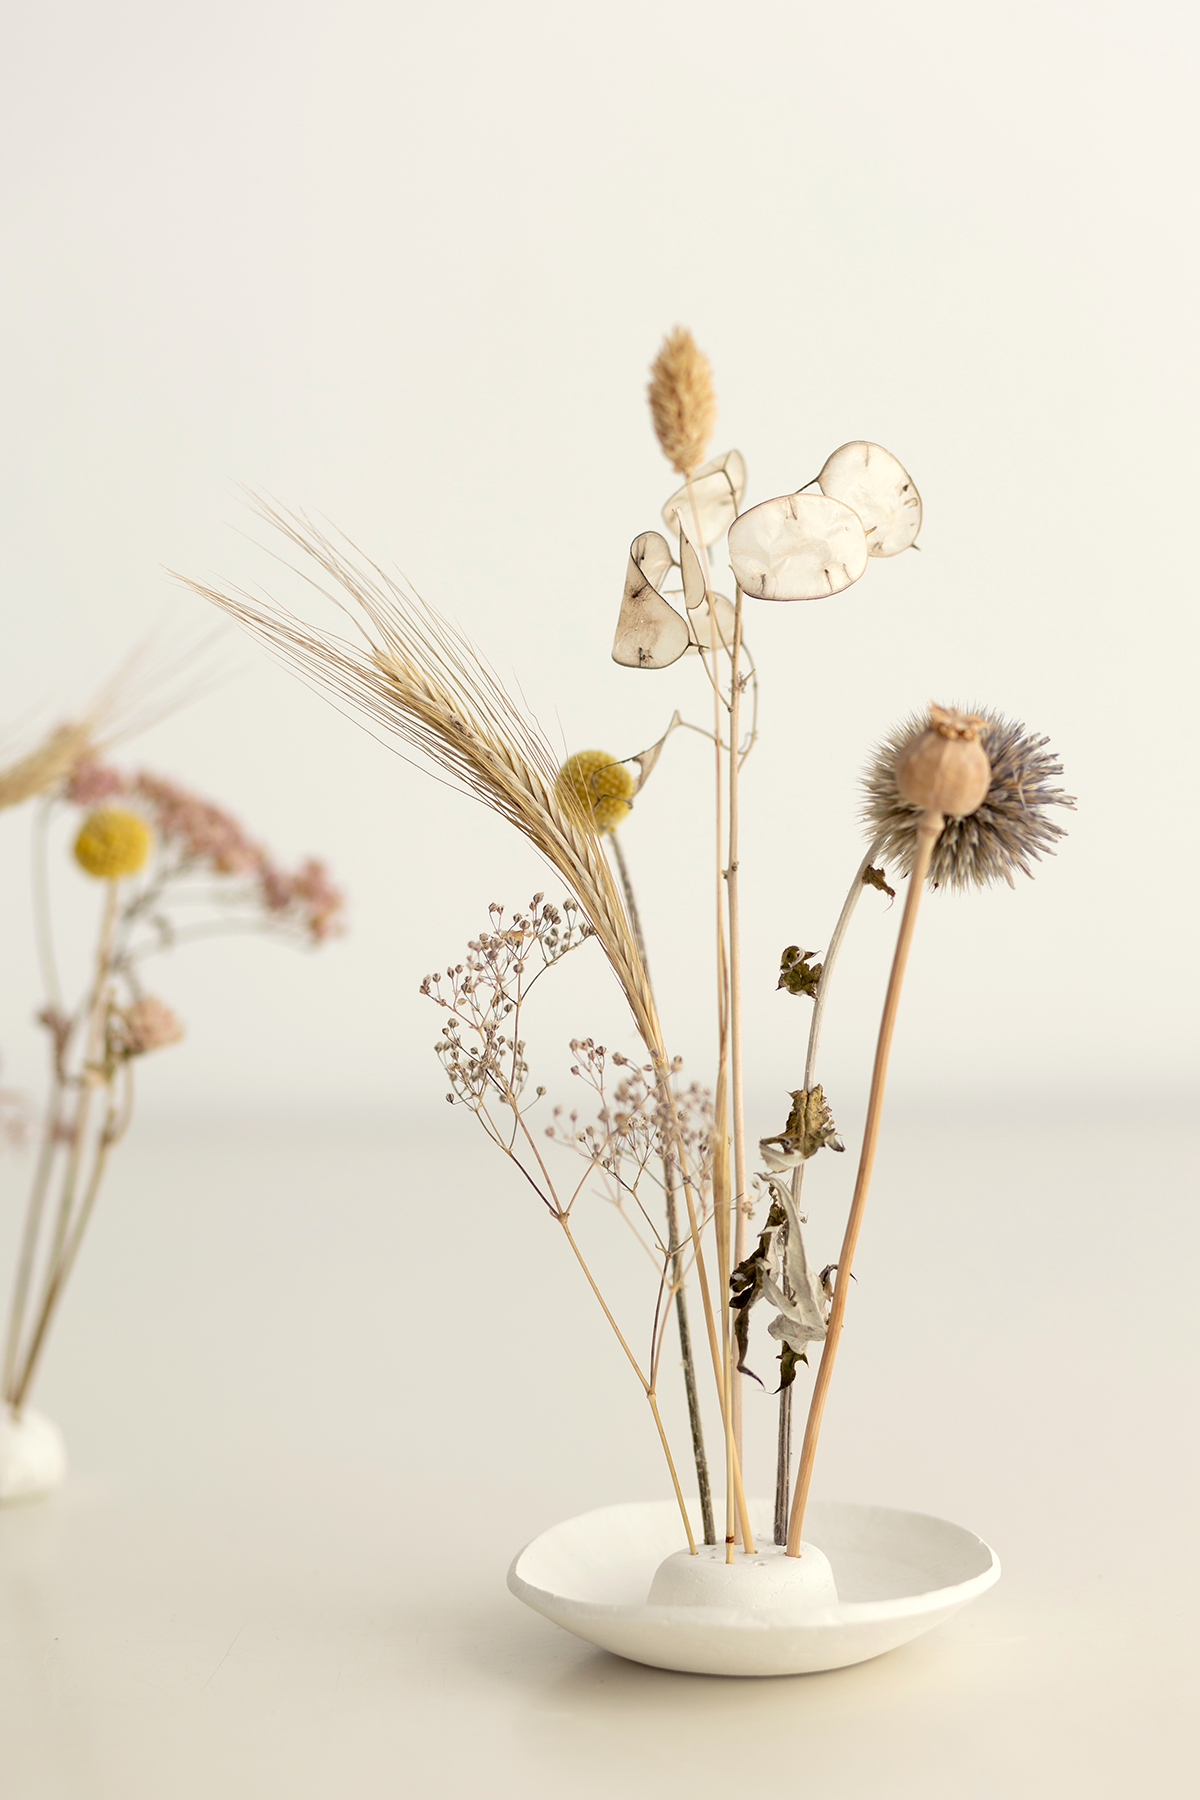 DIY: Trockenblumen-Display aus Modelliermasse oder Clay selber machen   we love handmade